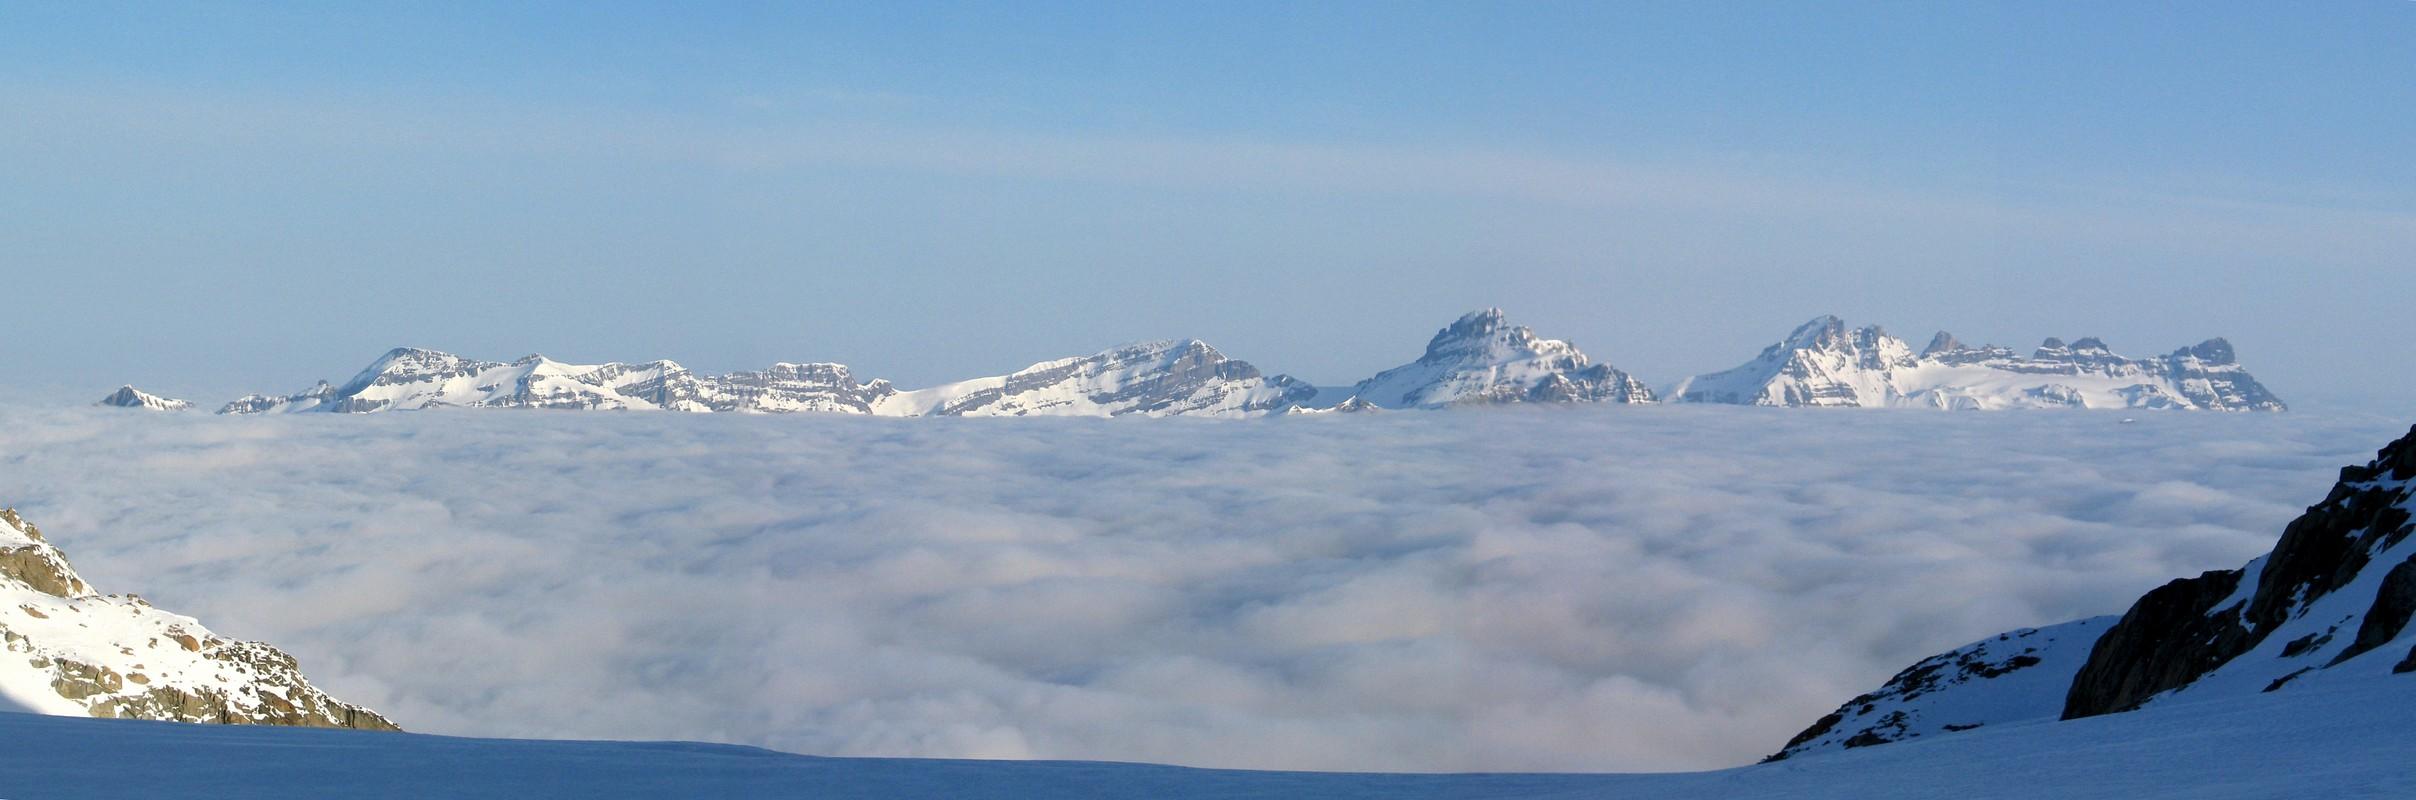 Cabane Trient Walliser Alpen / Alpes valaisannes Švýcarsko panorama 18